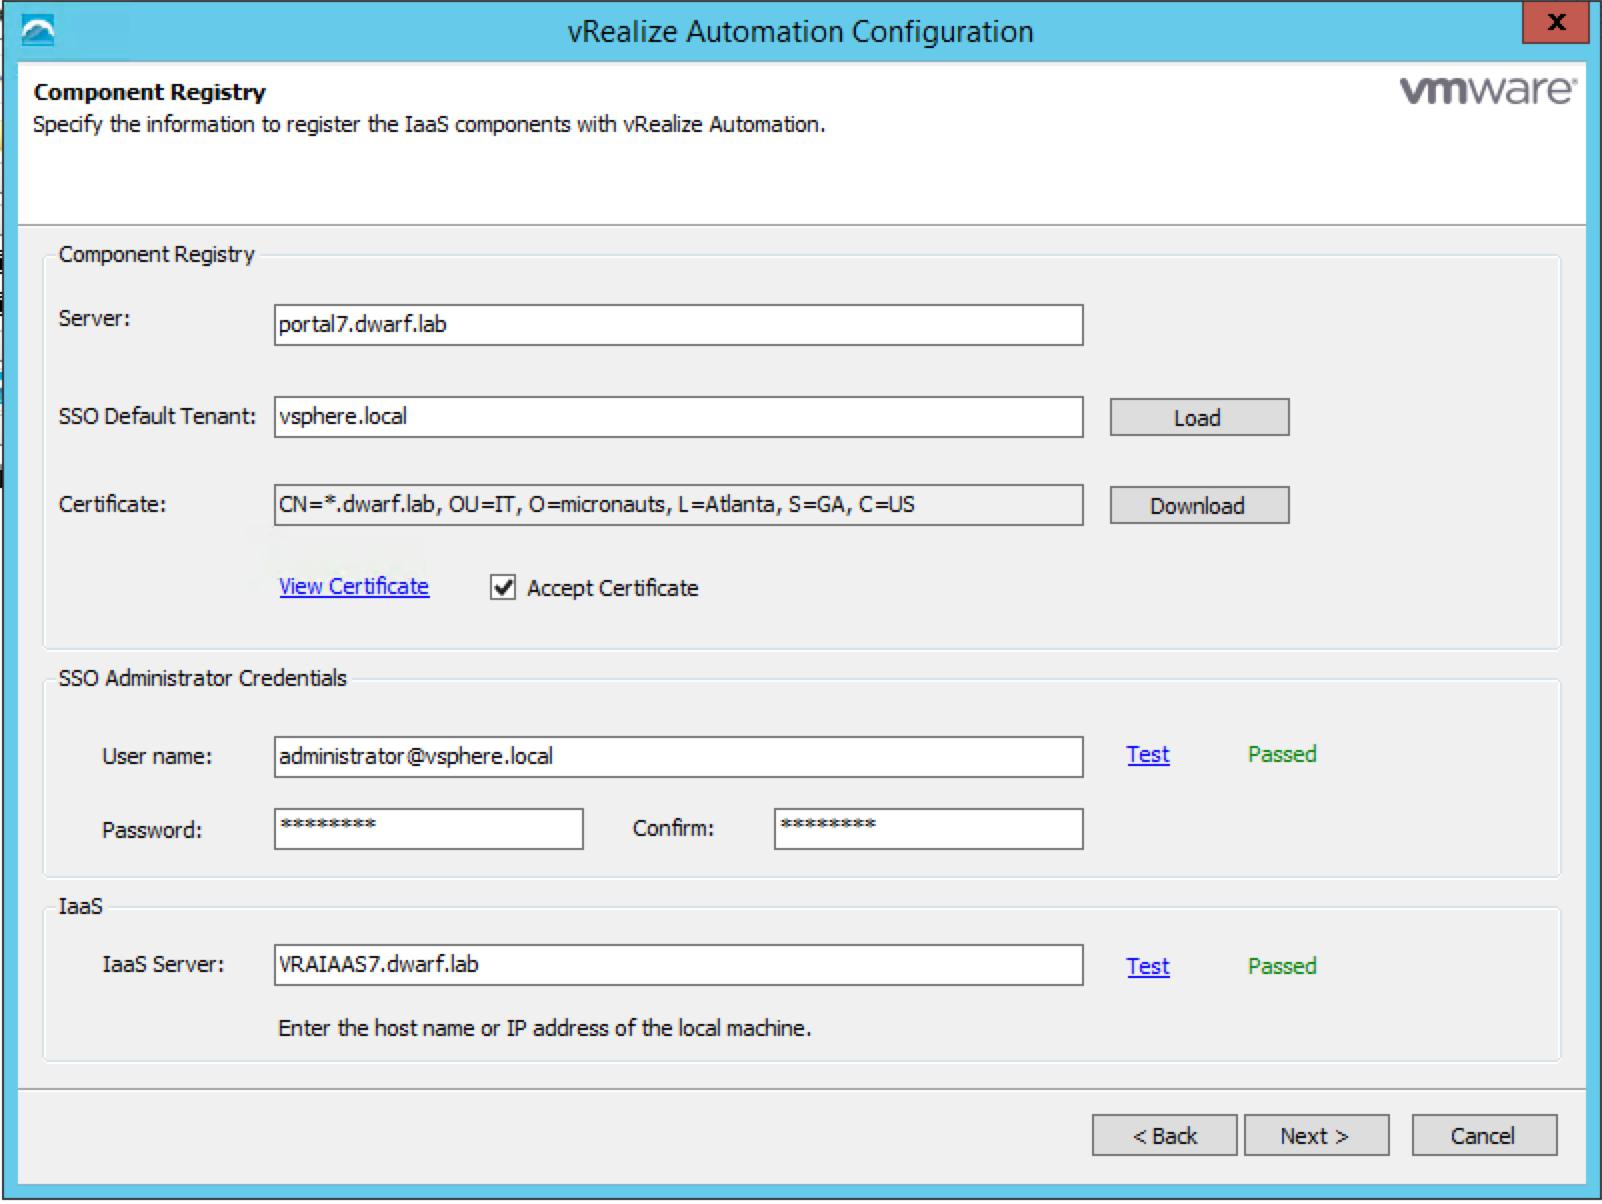 vRA 7.0.1 IaaS Installation – 9